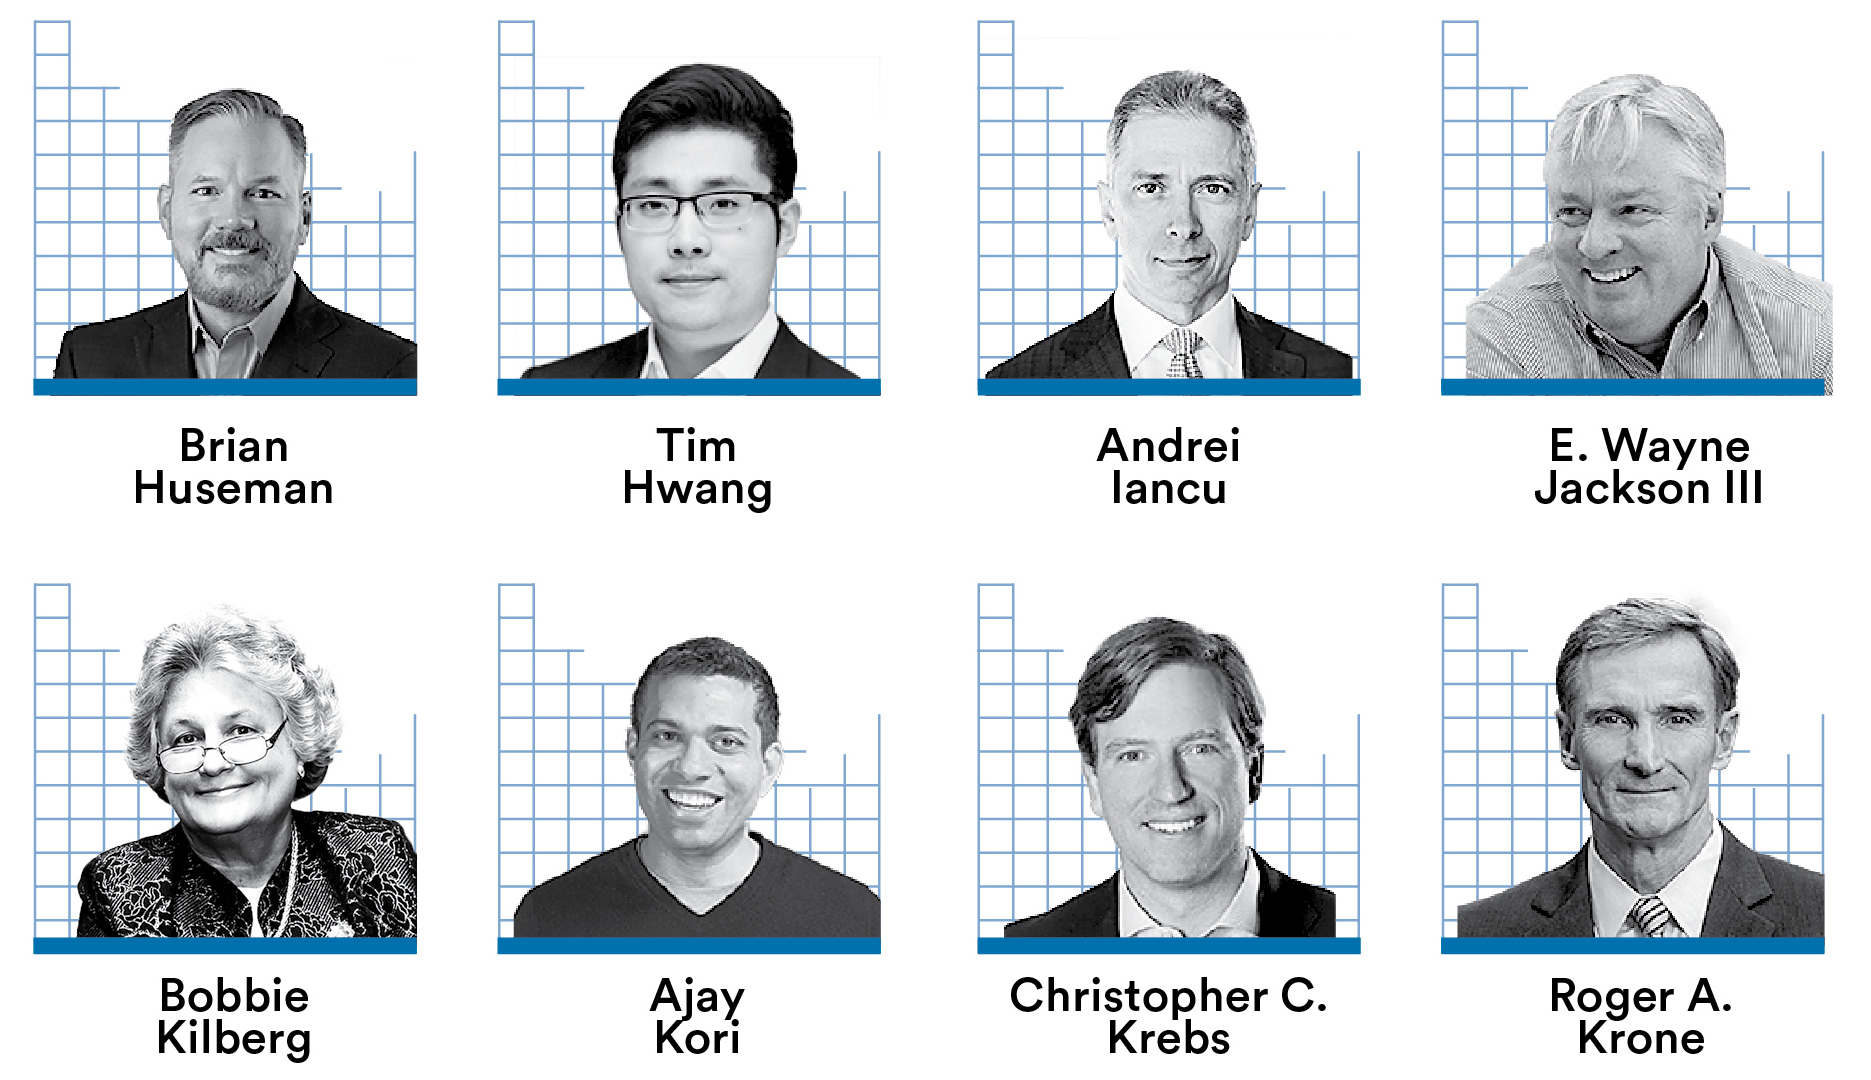 Tech Titans 2018: Washington's Top Tech Leaders